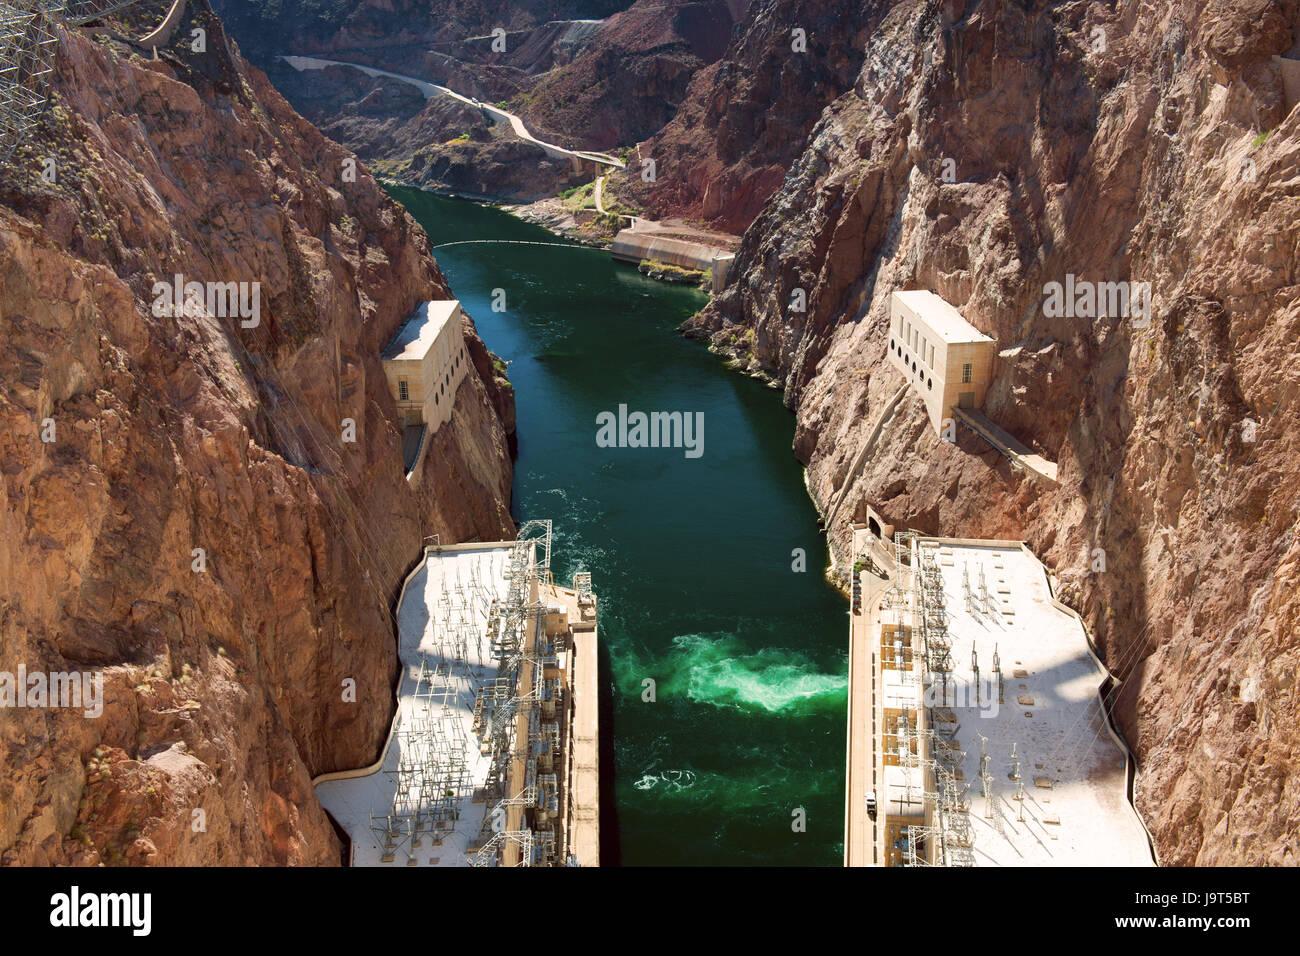 Hoover Dam, on the Nevada-Arizona border, USA - Stock Image